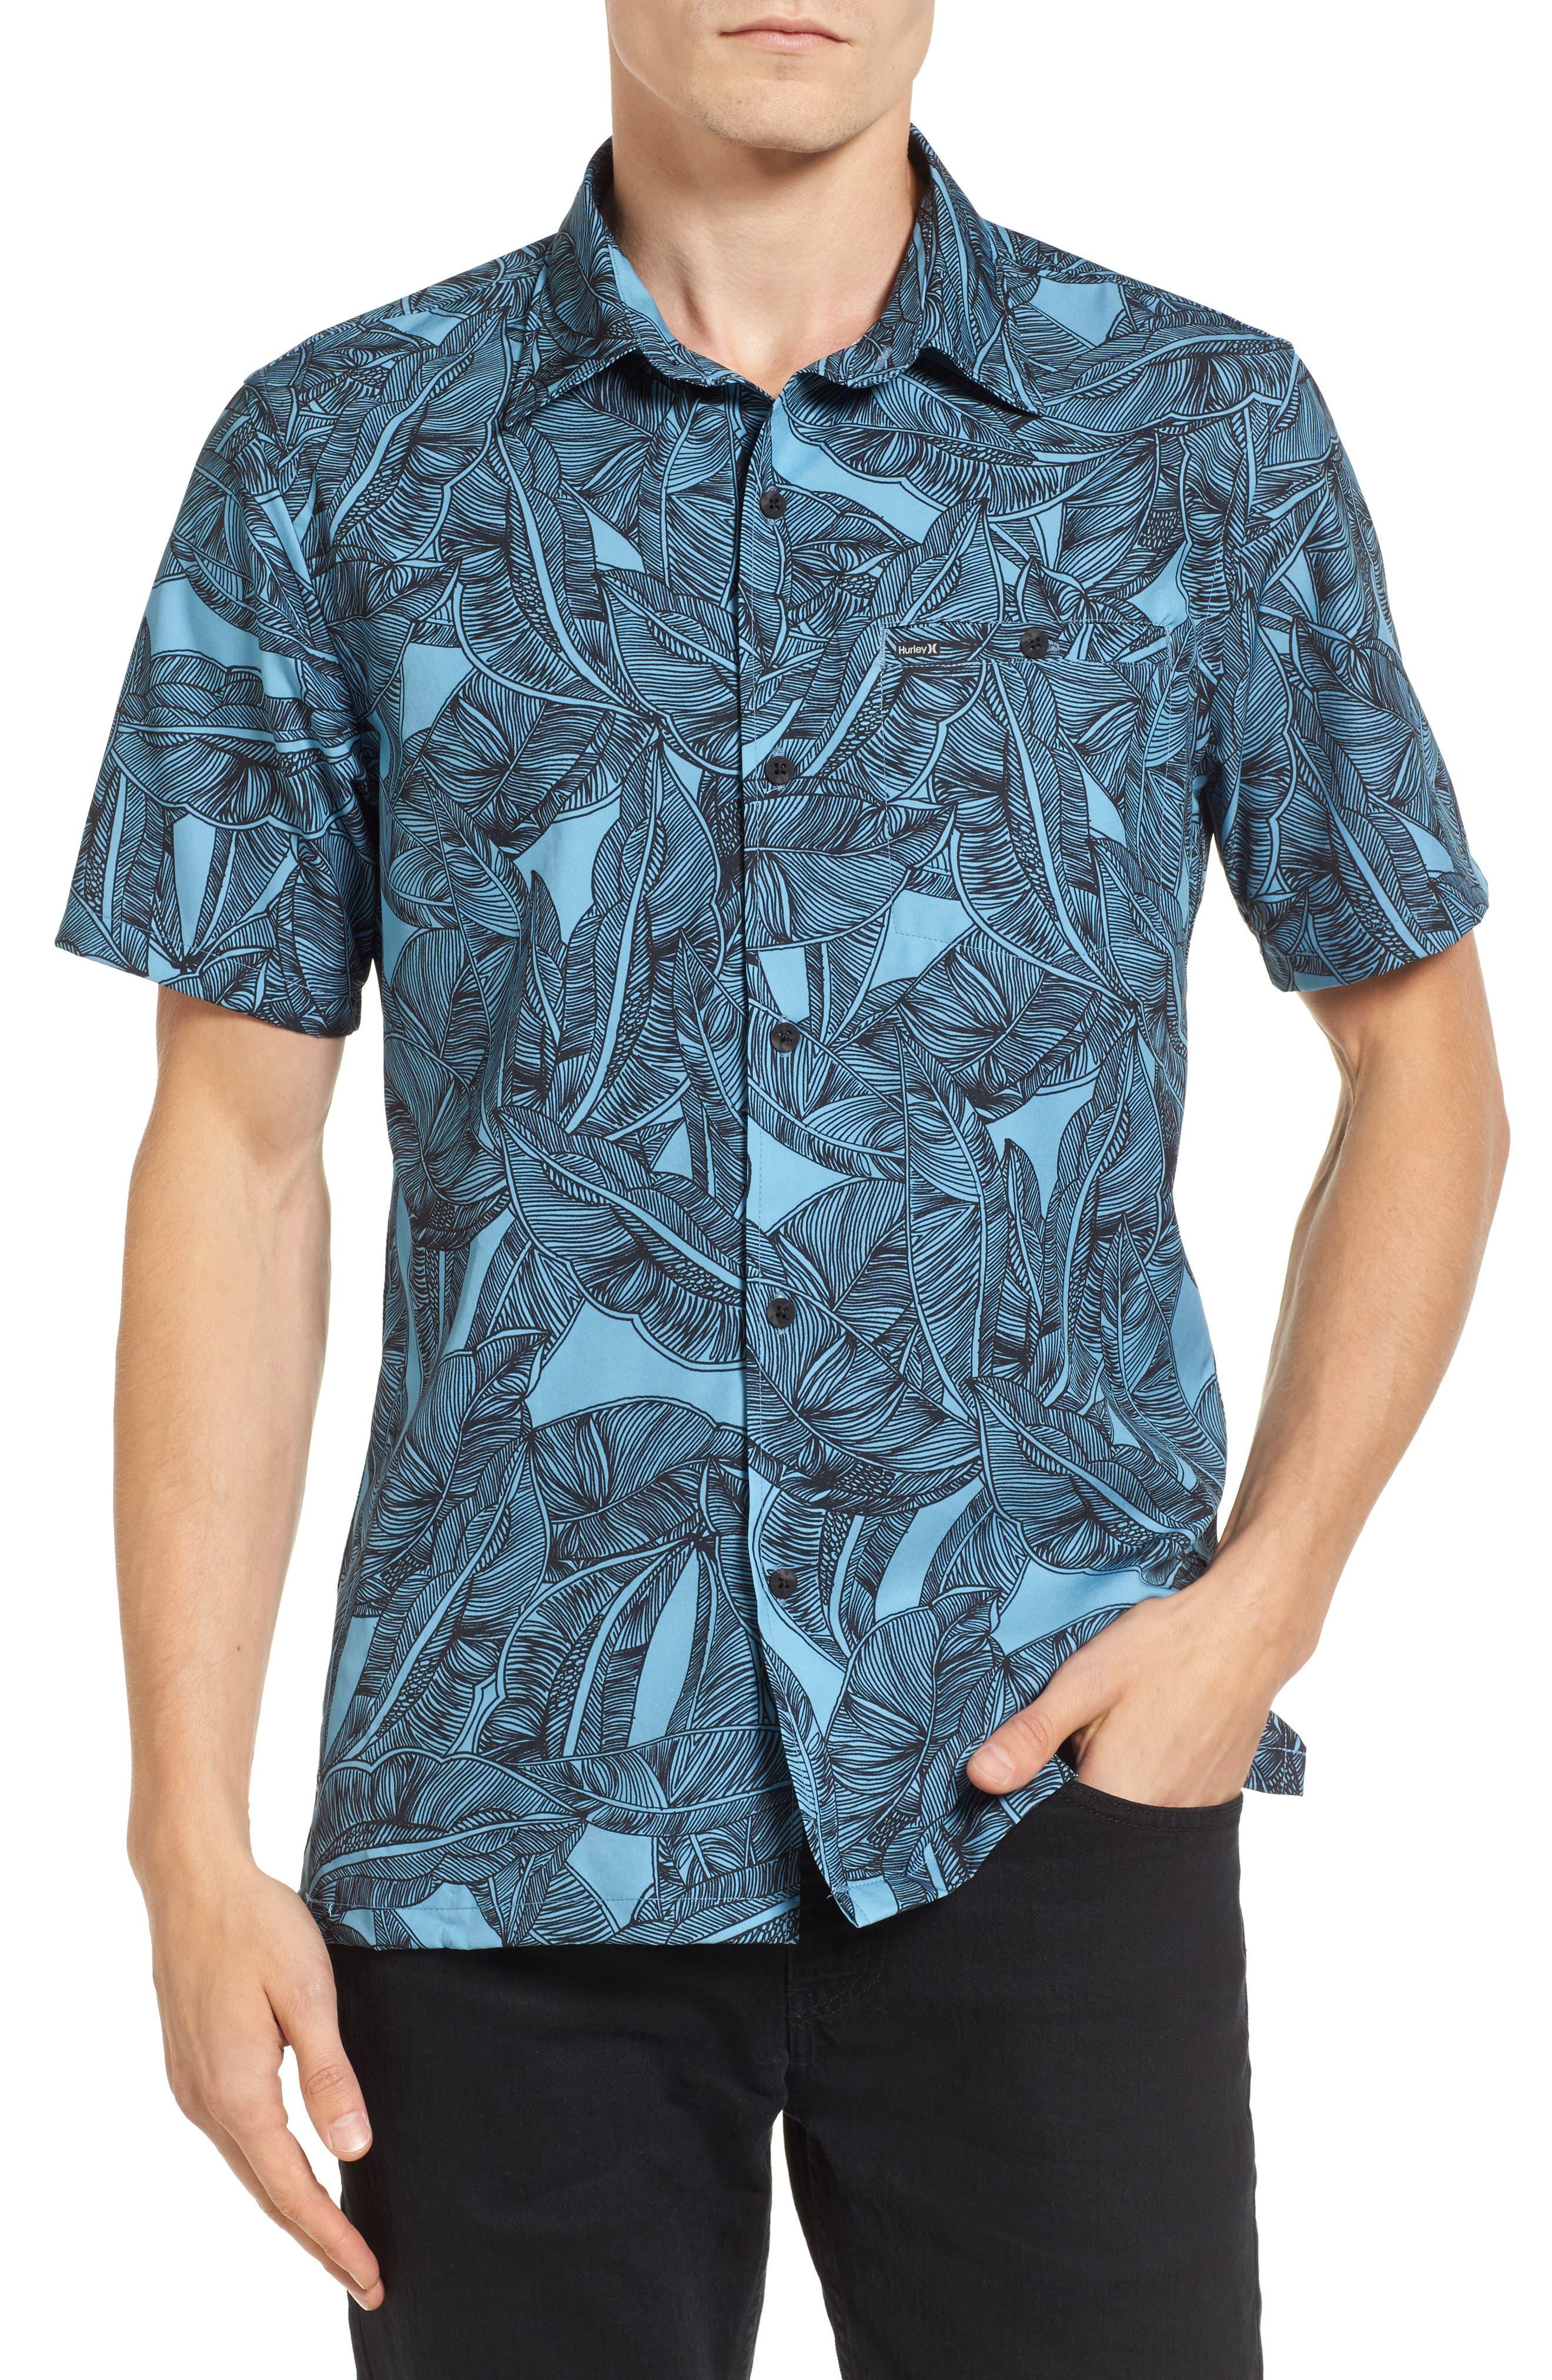 Alternate Image 1 Selected - Hurley Lush Woven Shirt